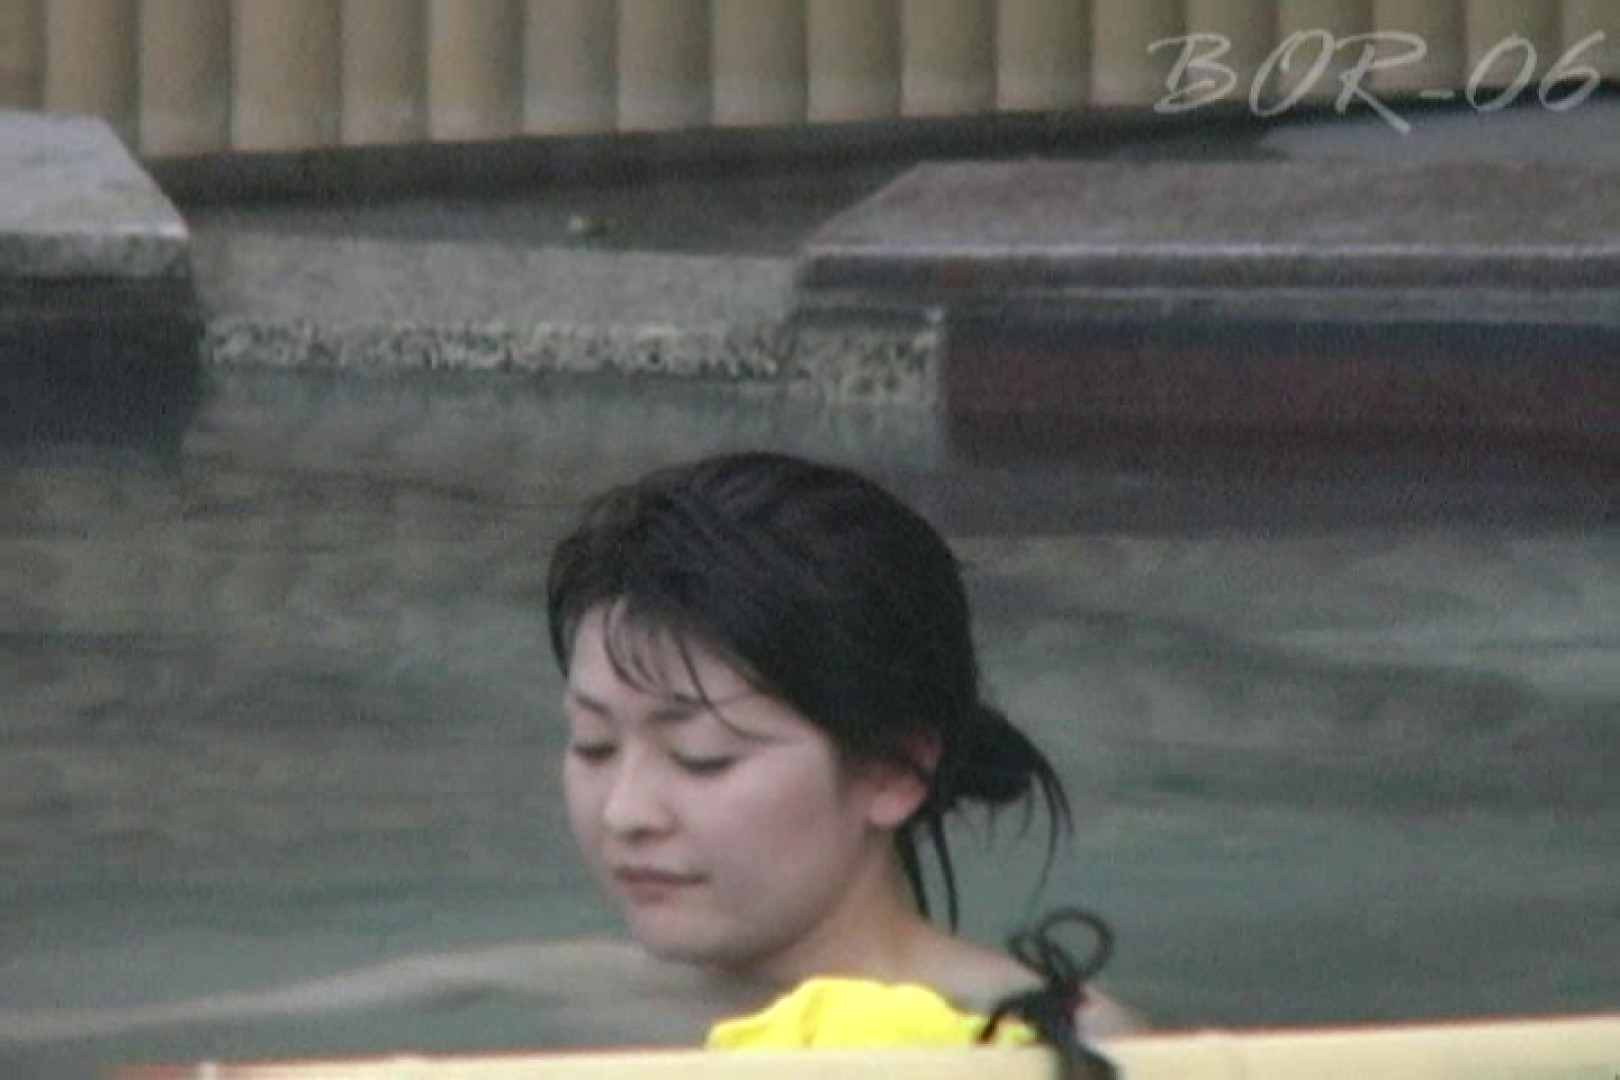 Aquaな露天風呂Vol.523 盗撮映像  93Pix 6